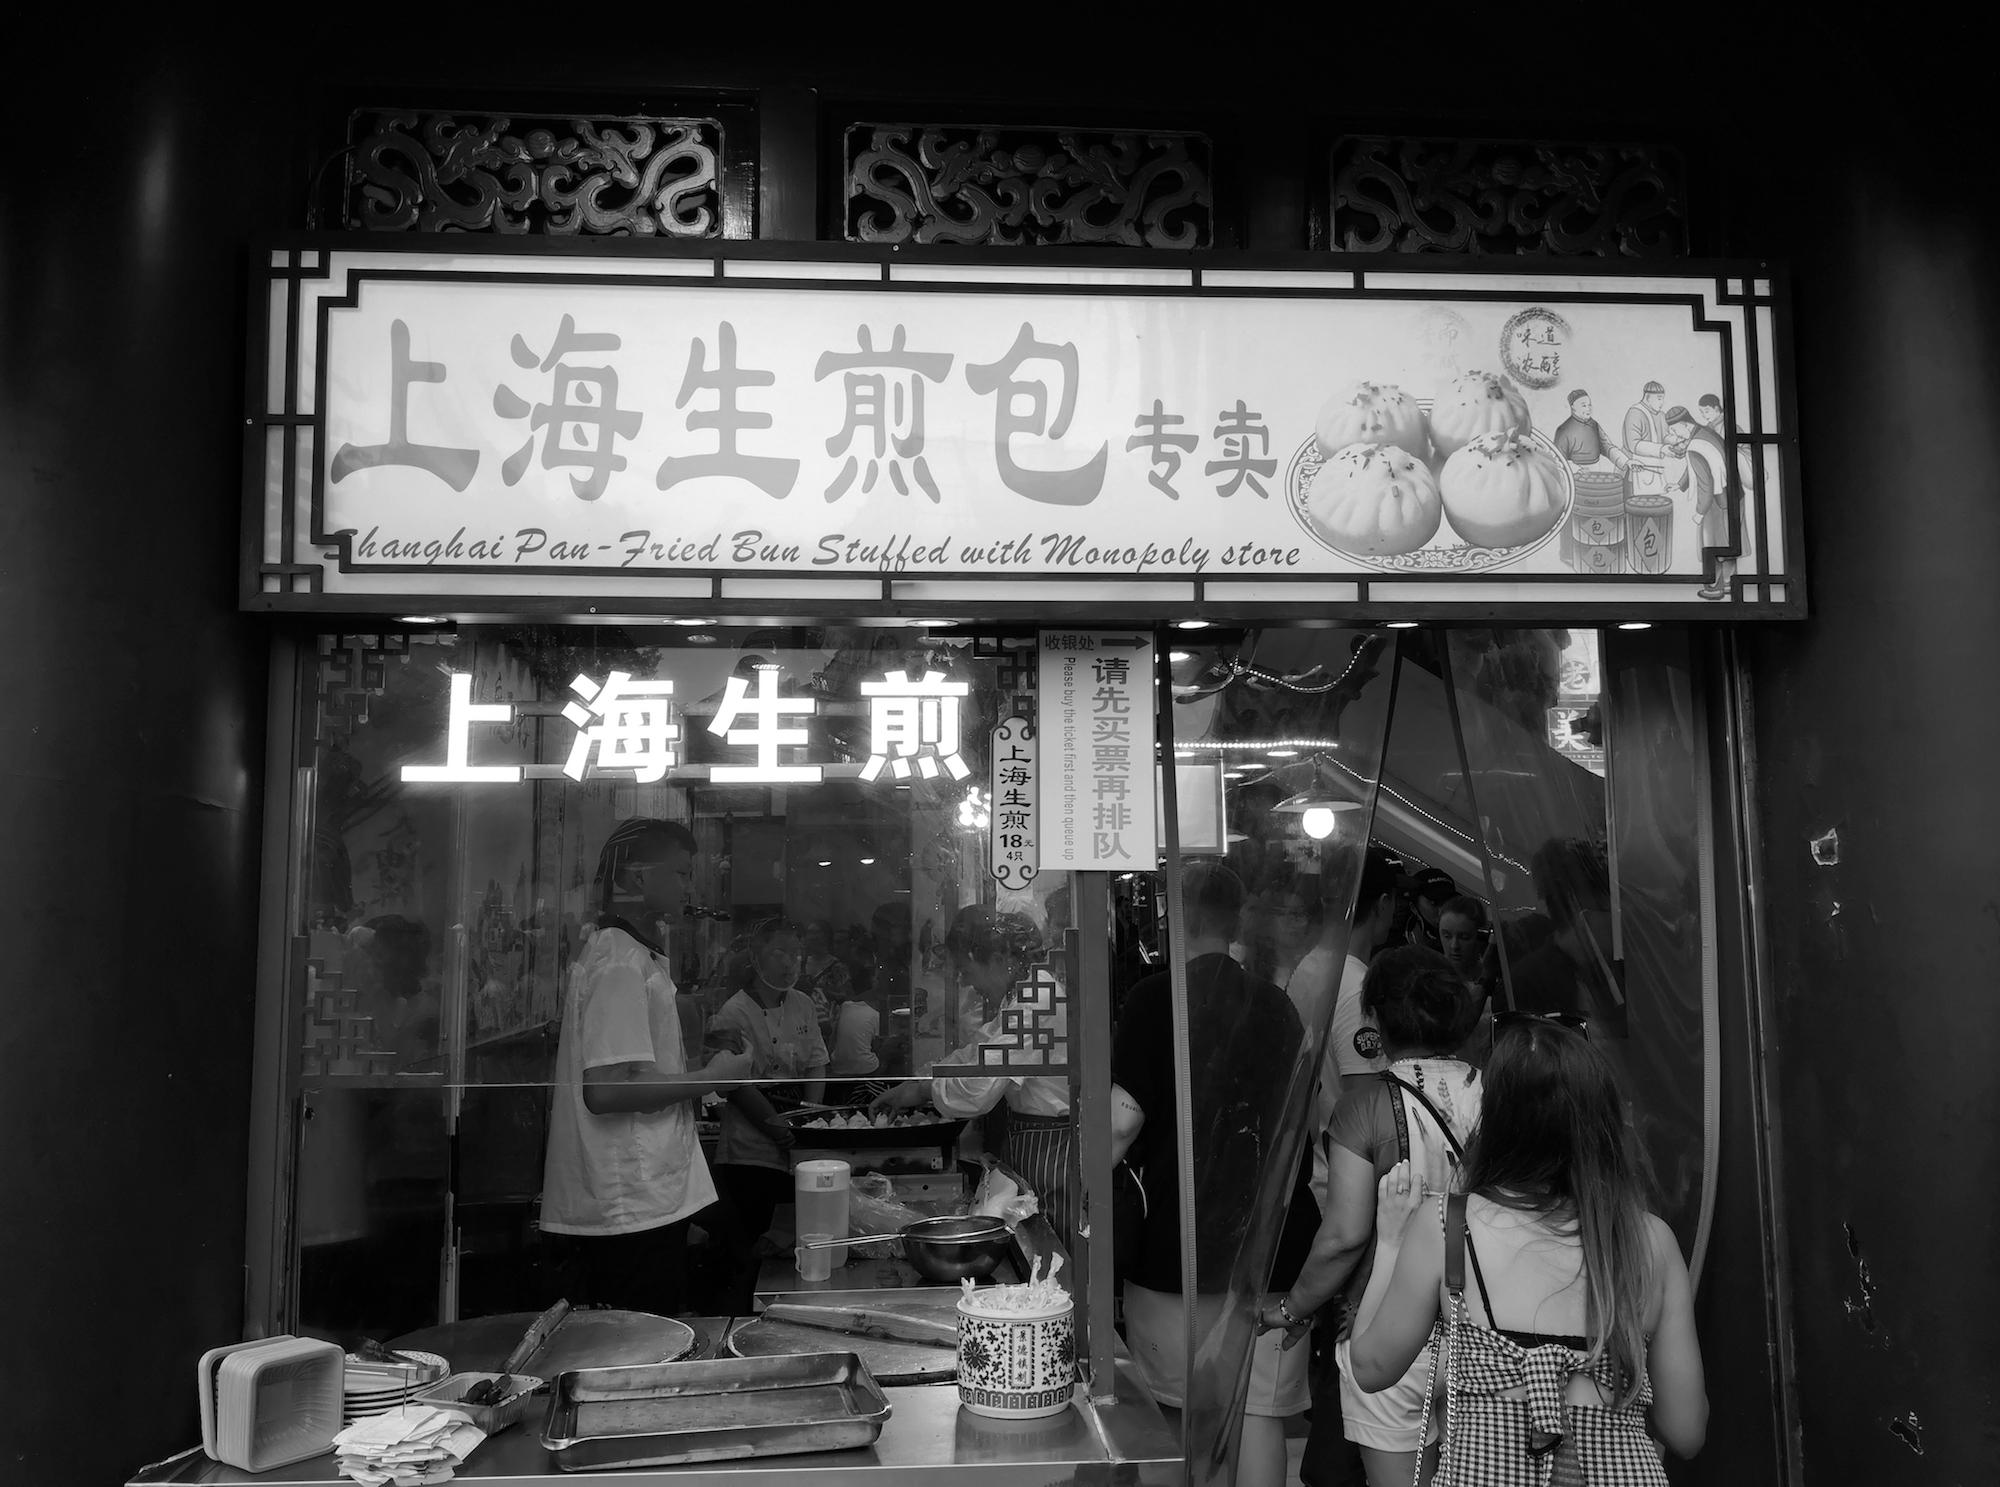 Shanghai-Dumplings